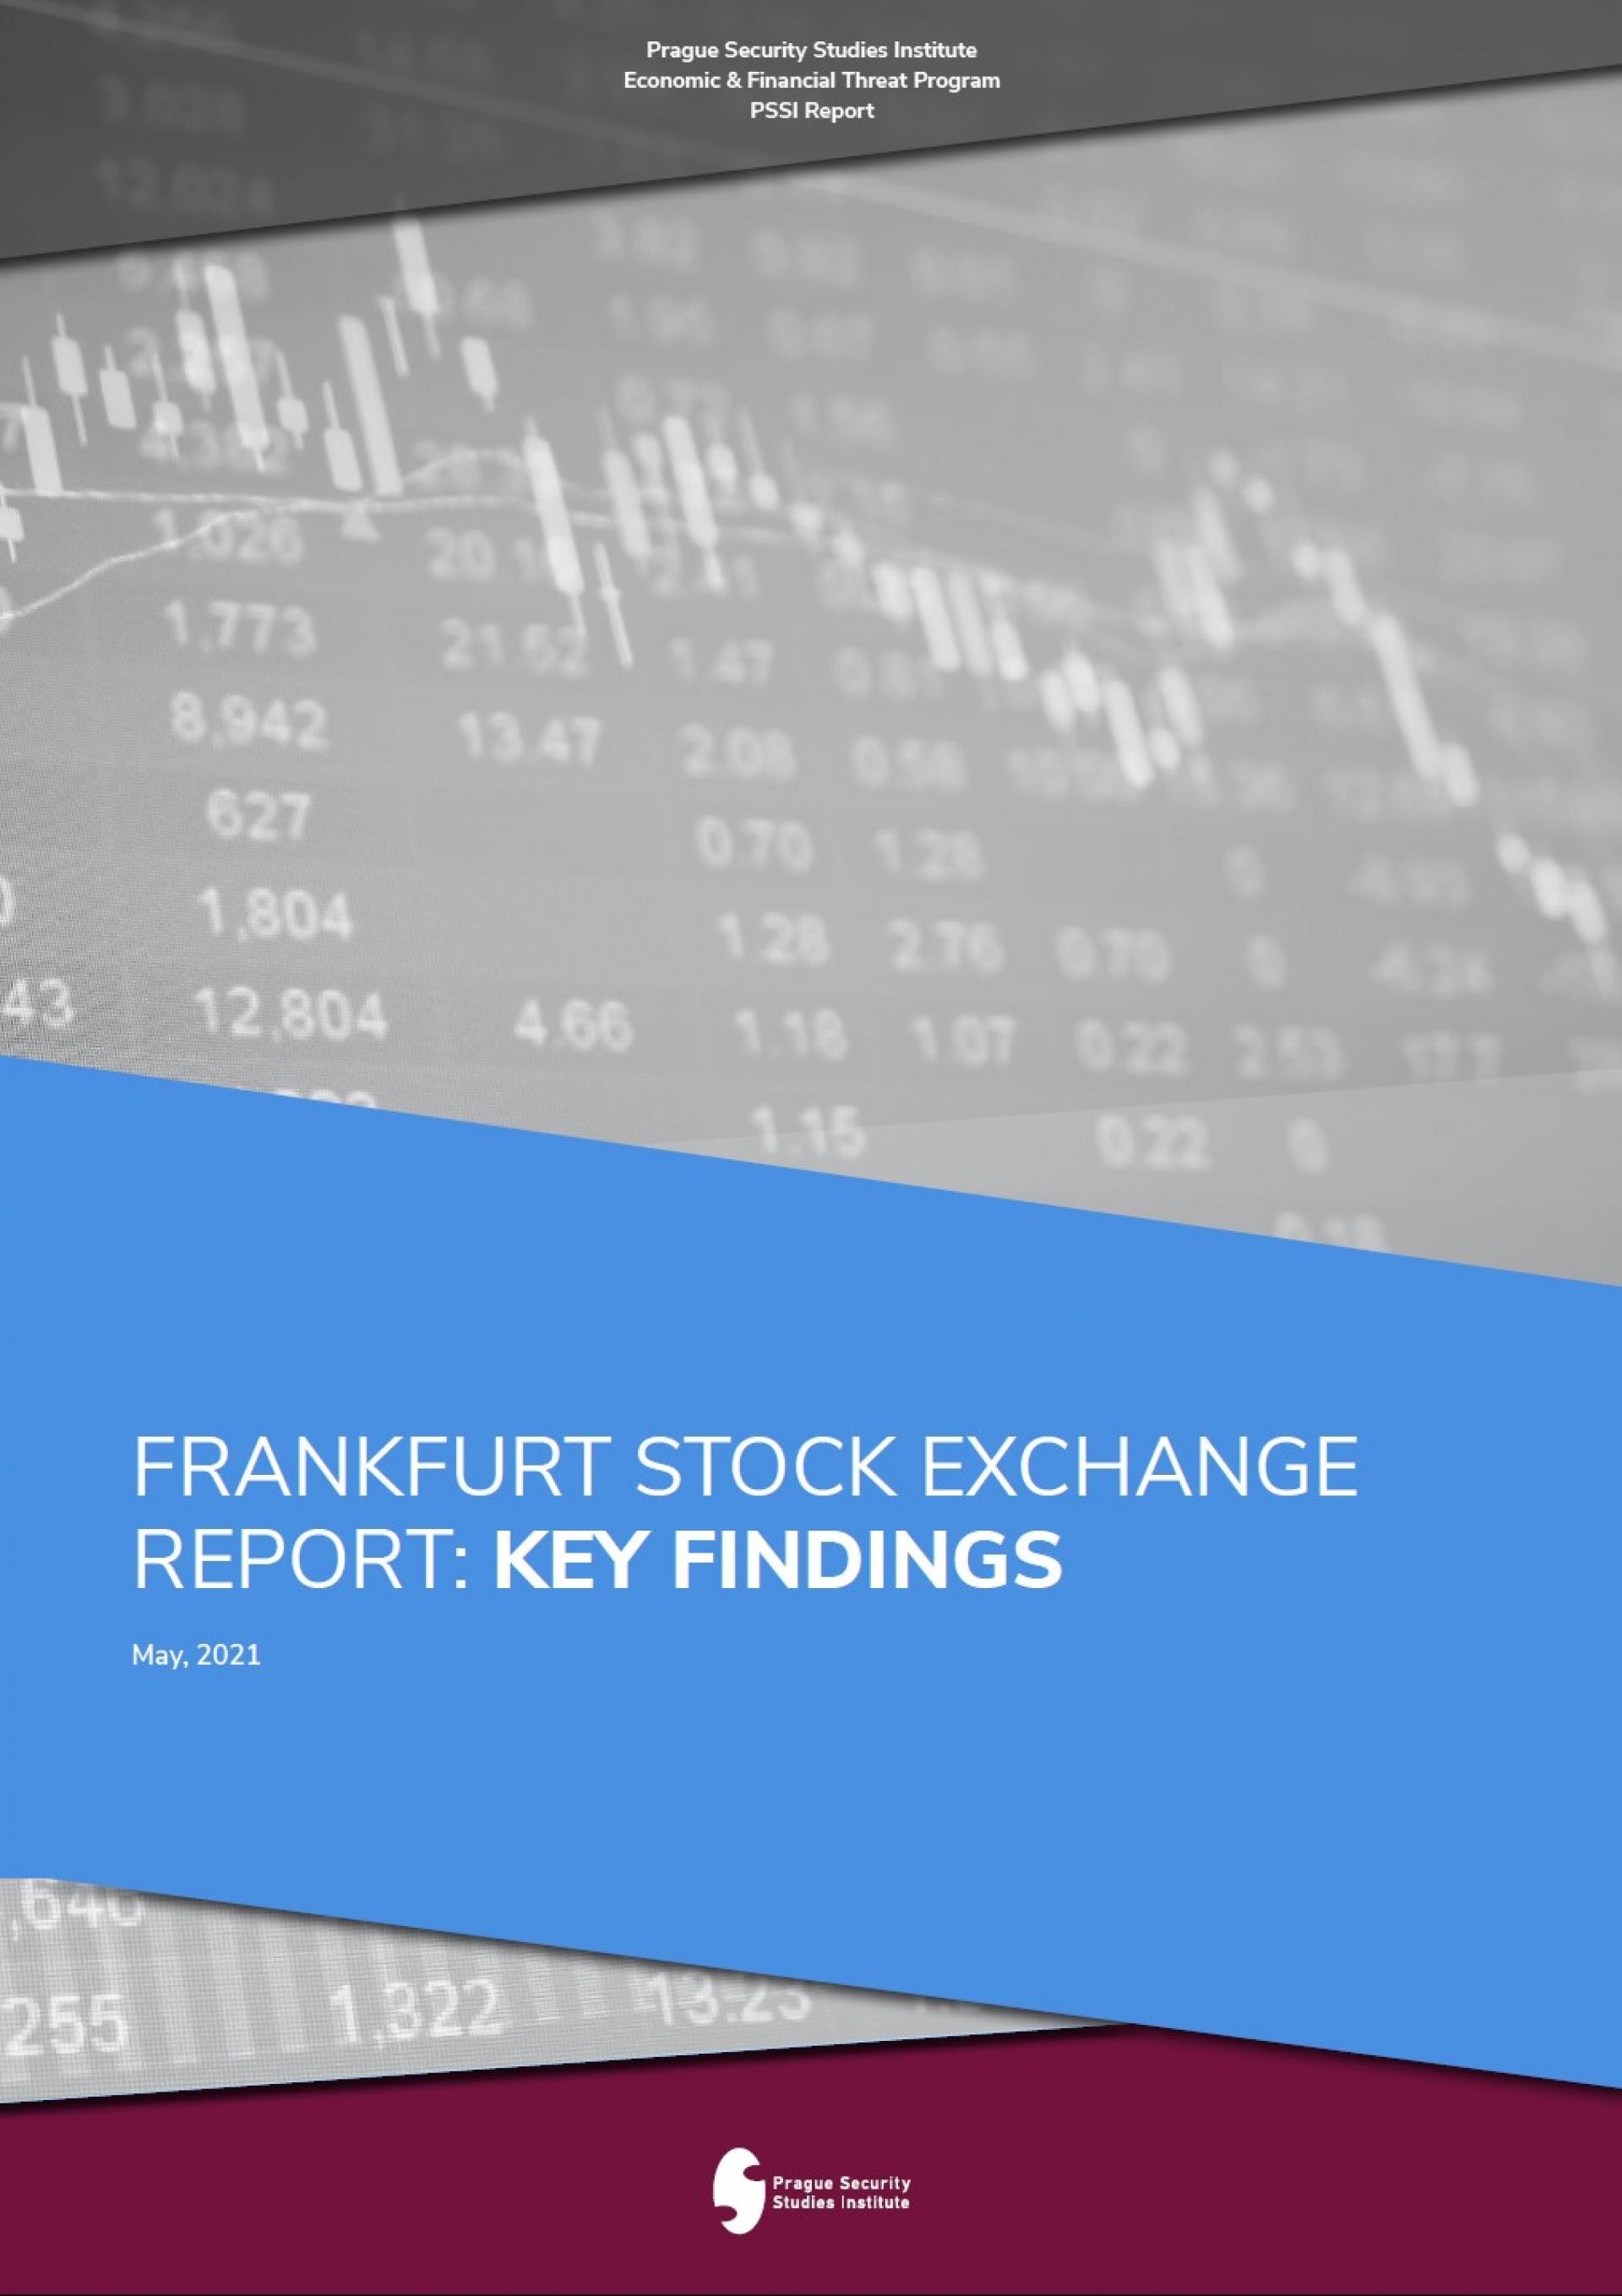 Frankfurt Report Summary Key Findings Coverpage